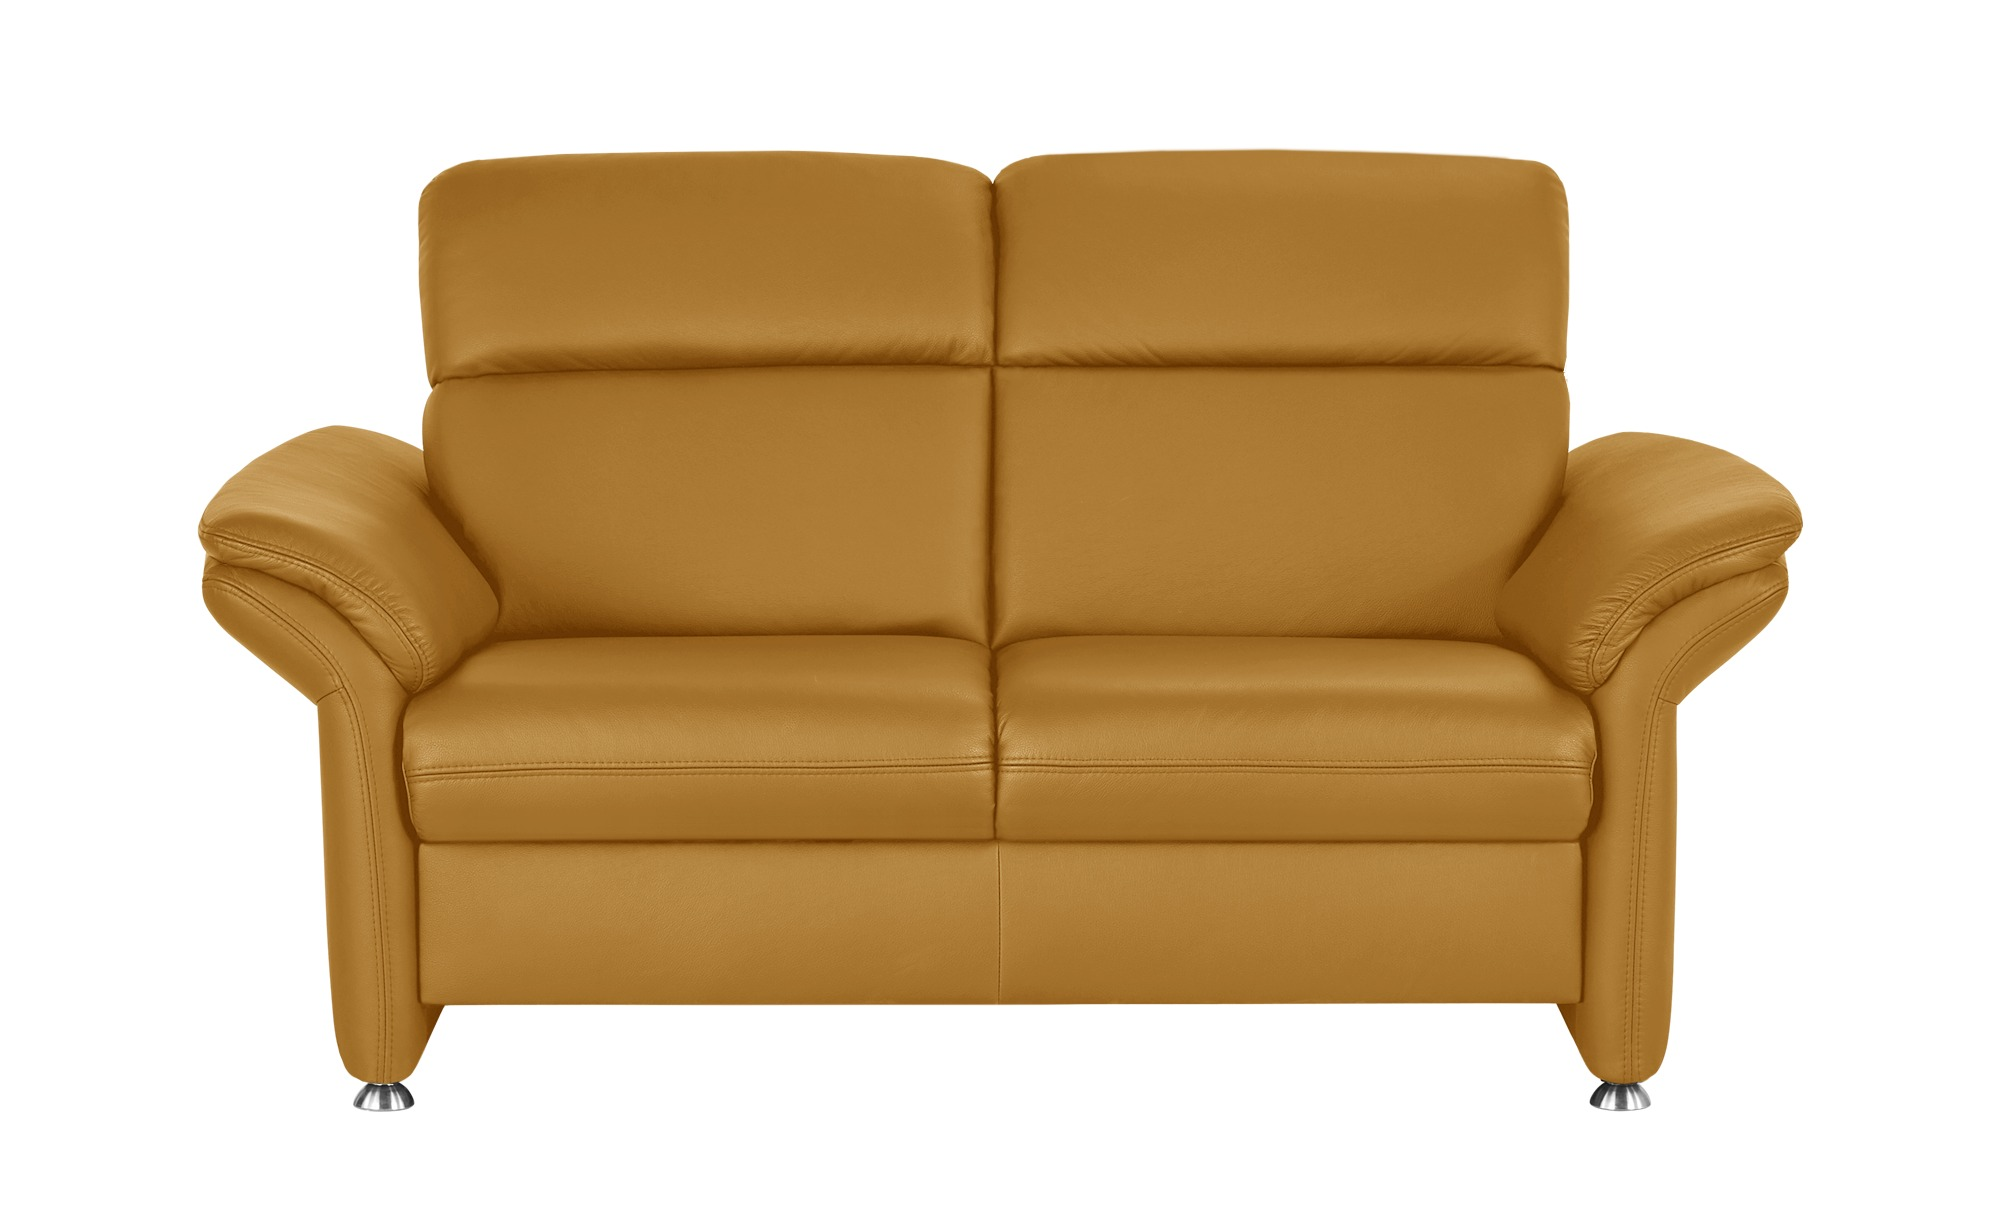 meinSofa Ledersofa gelb - Leder Manon ¦ gelb ¦ Maße (cm): B: 170 H: 94 T: 92 Polstermöbel > Sofas > 2-Sitzer - Höffner